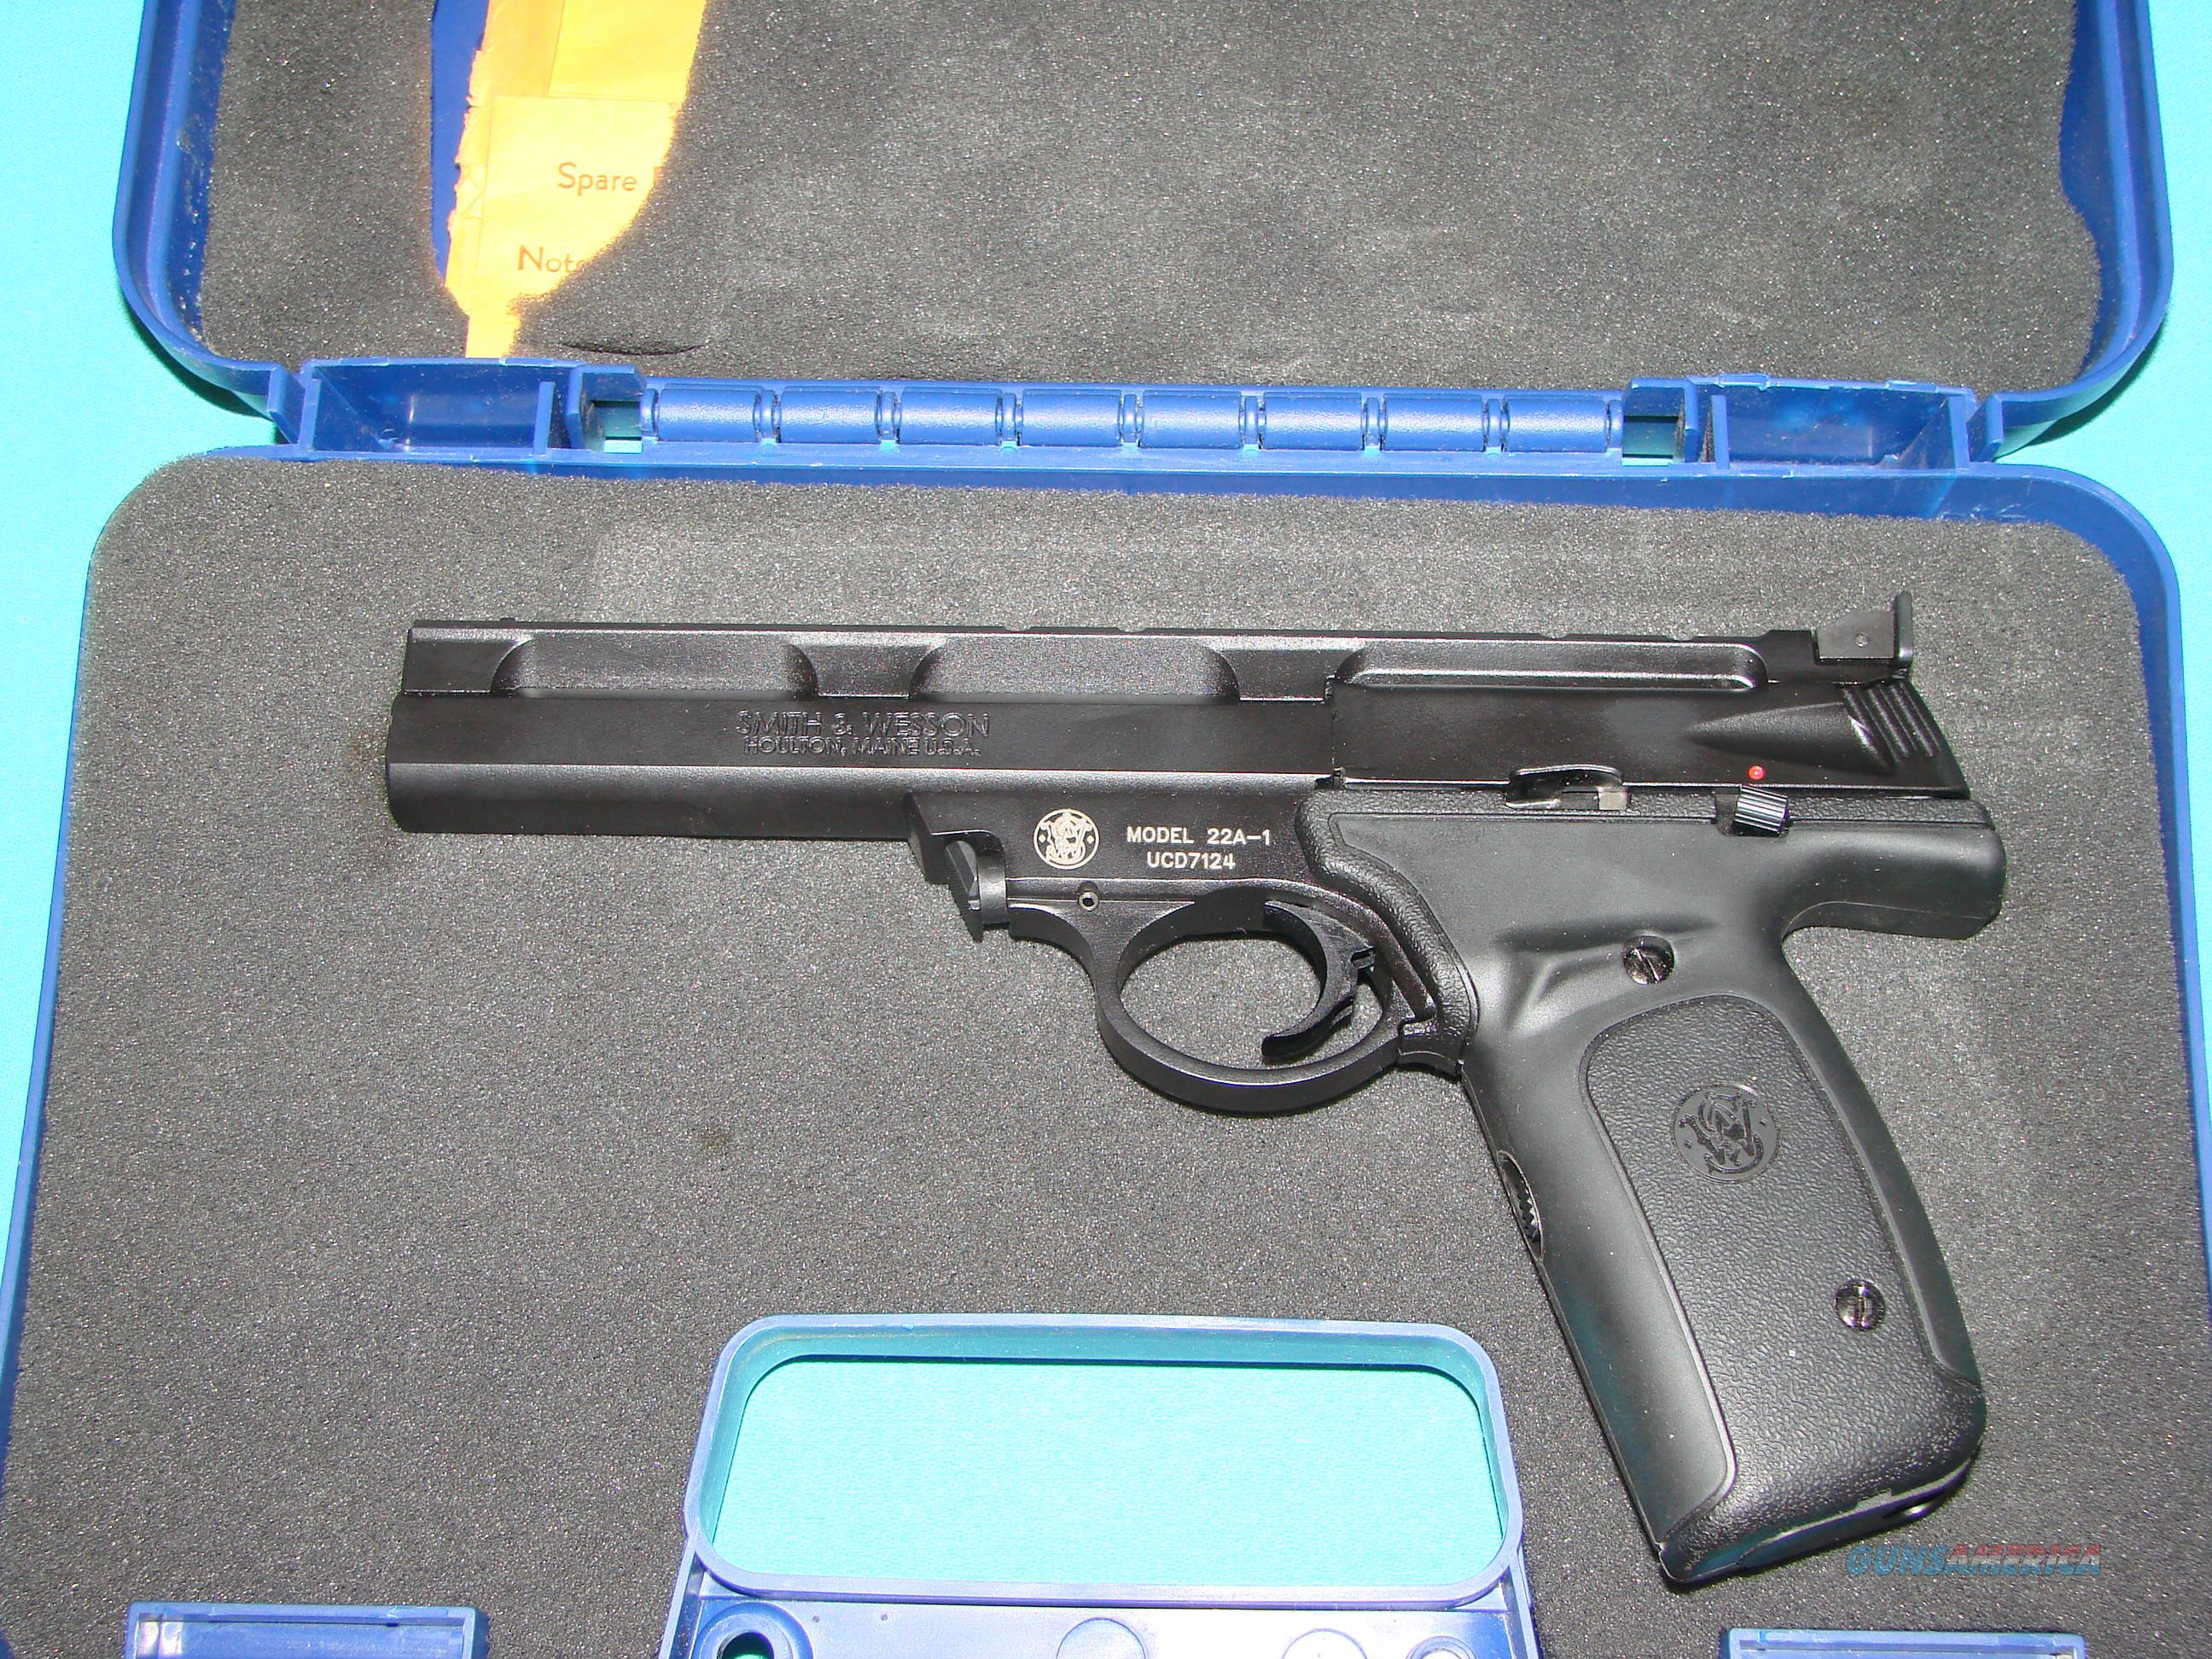 S&W 22A-1  Guns > Pistols > Smith & Wesson Pistols - Autos > .22 Autos